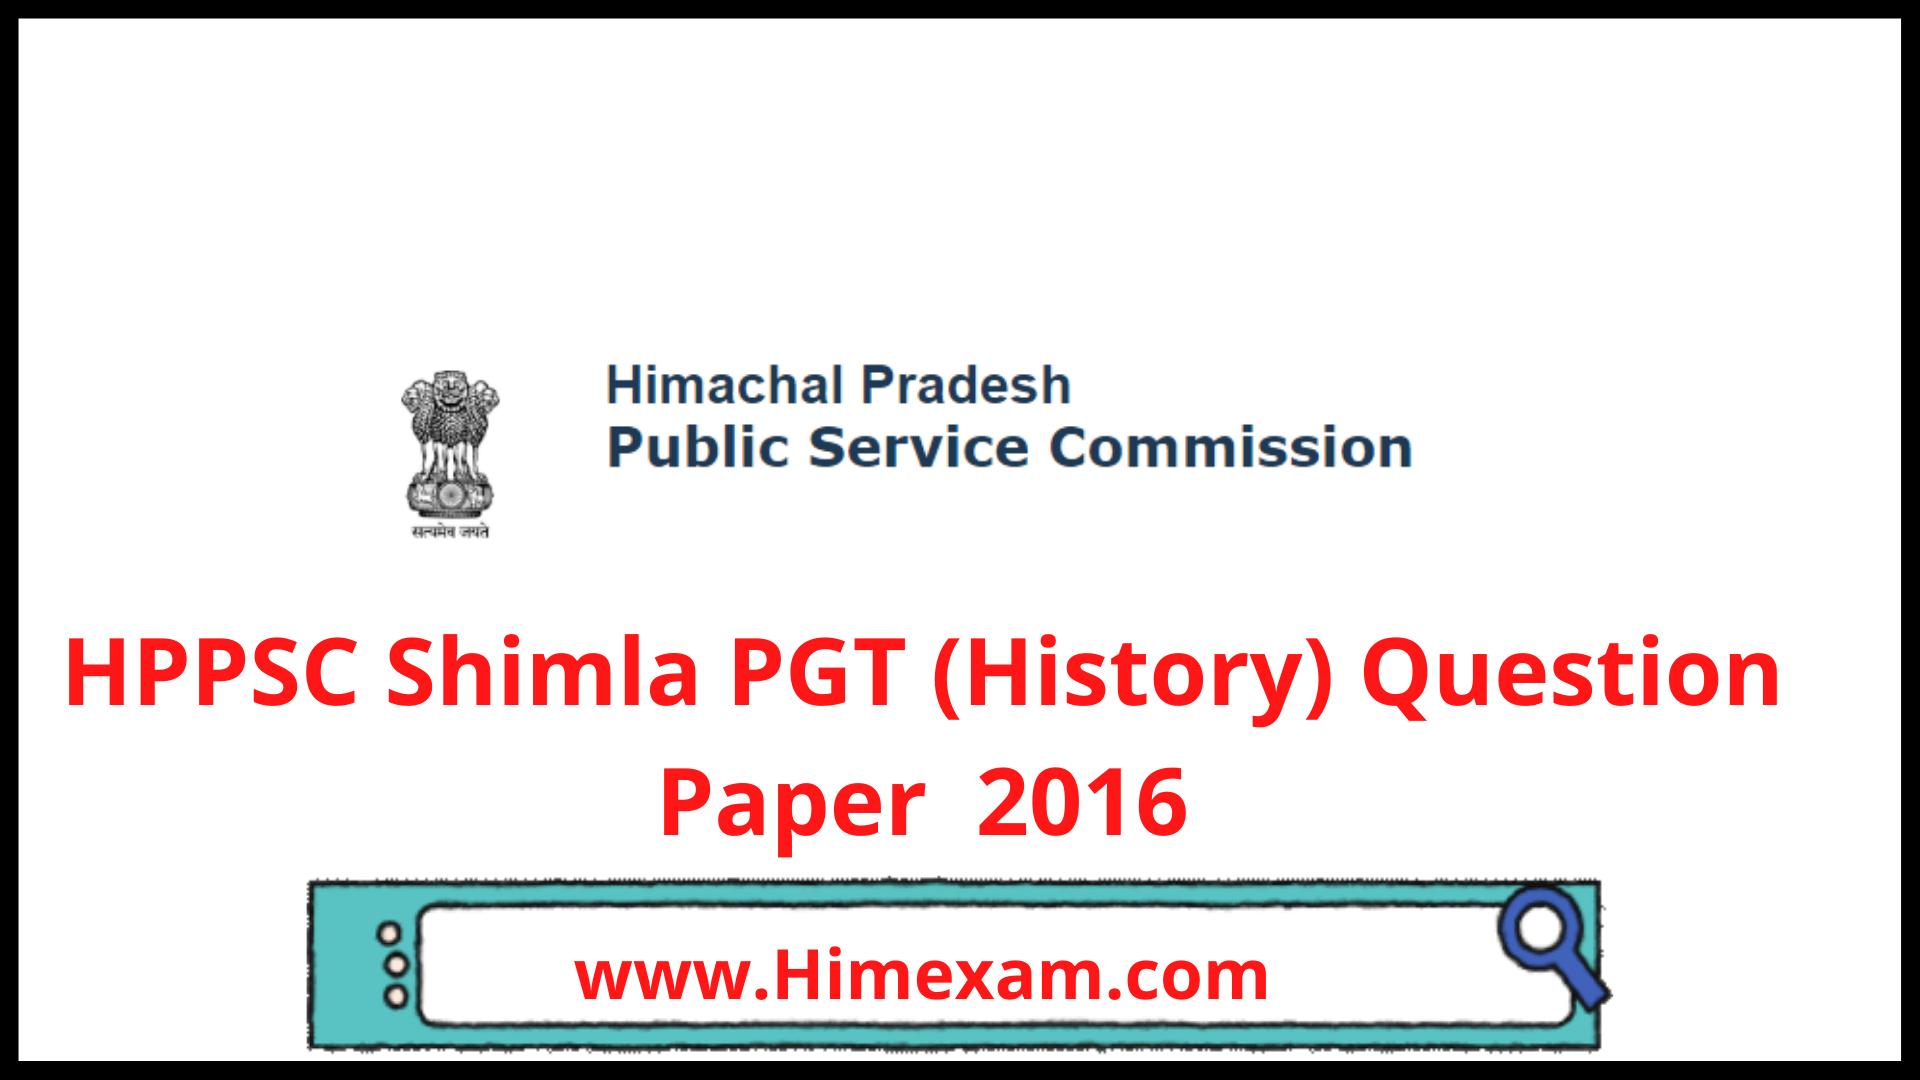 HPPSC Shimla PGT (History) Question Paper  2016